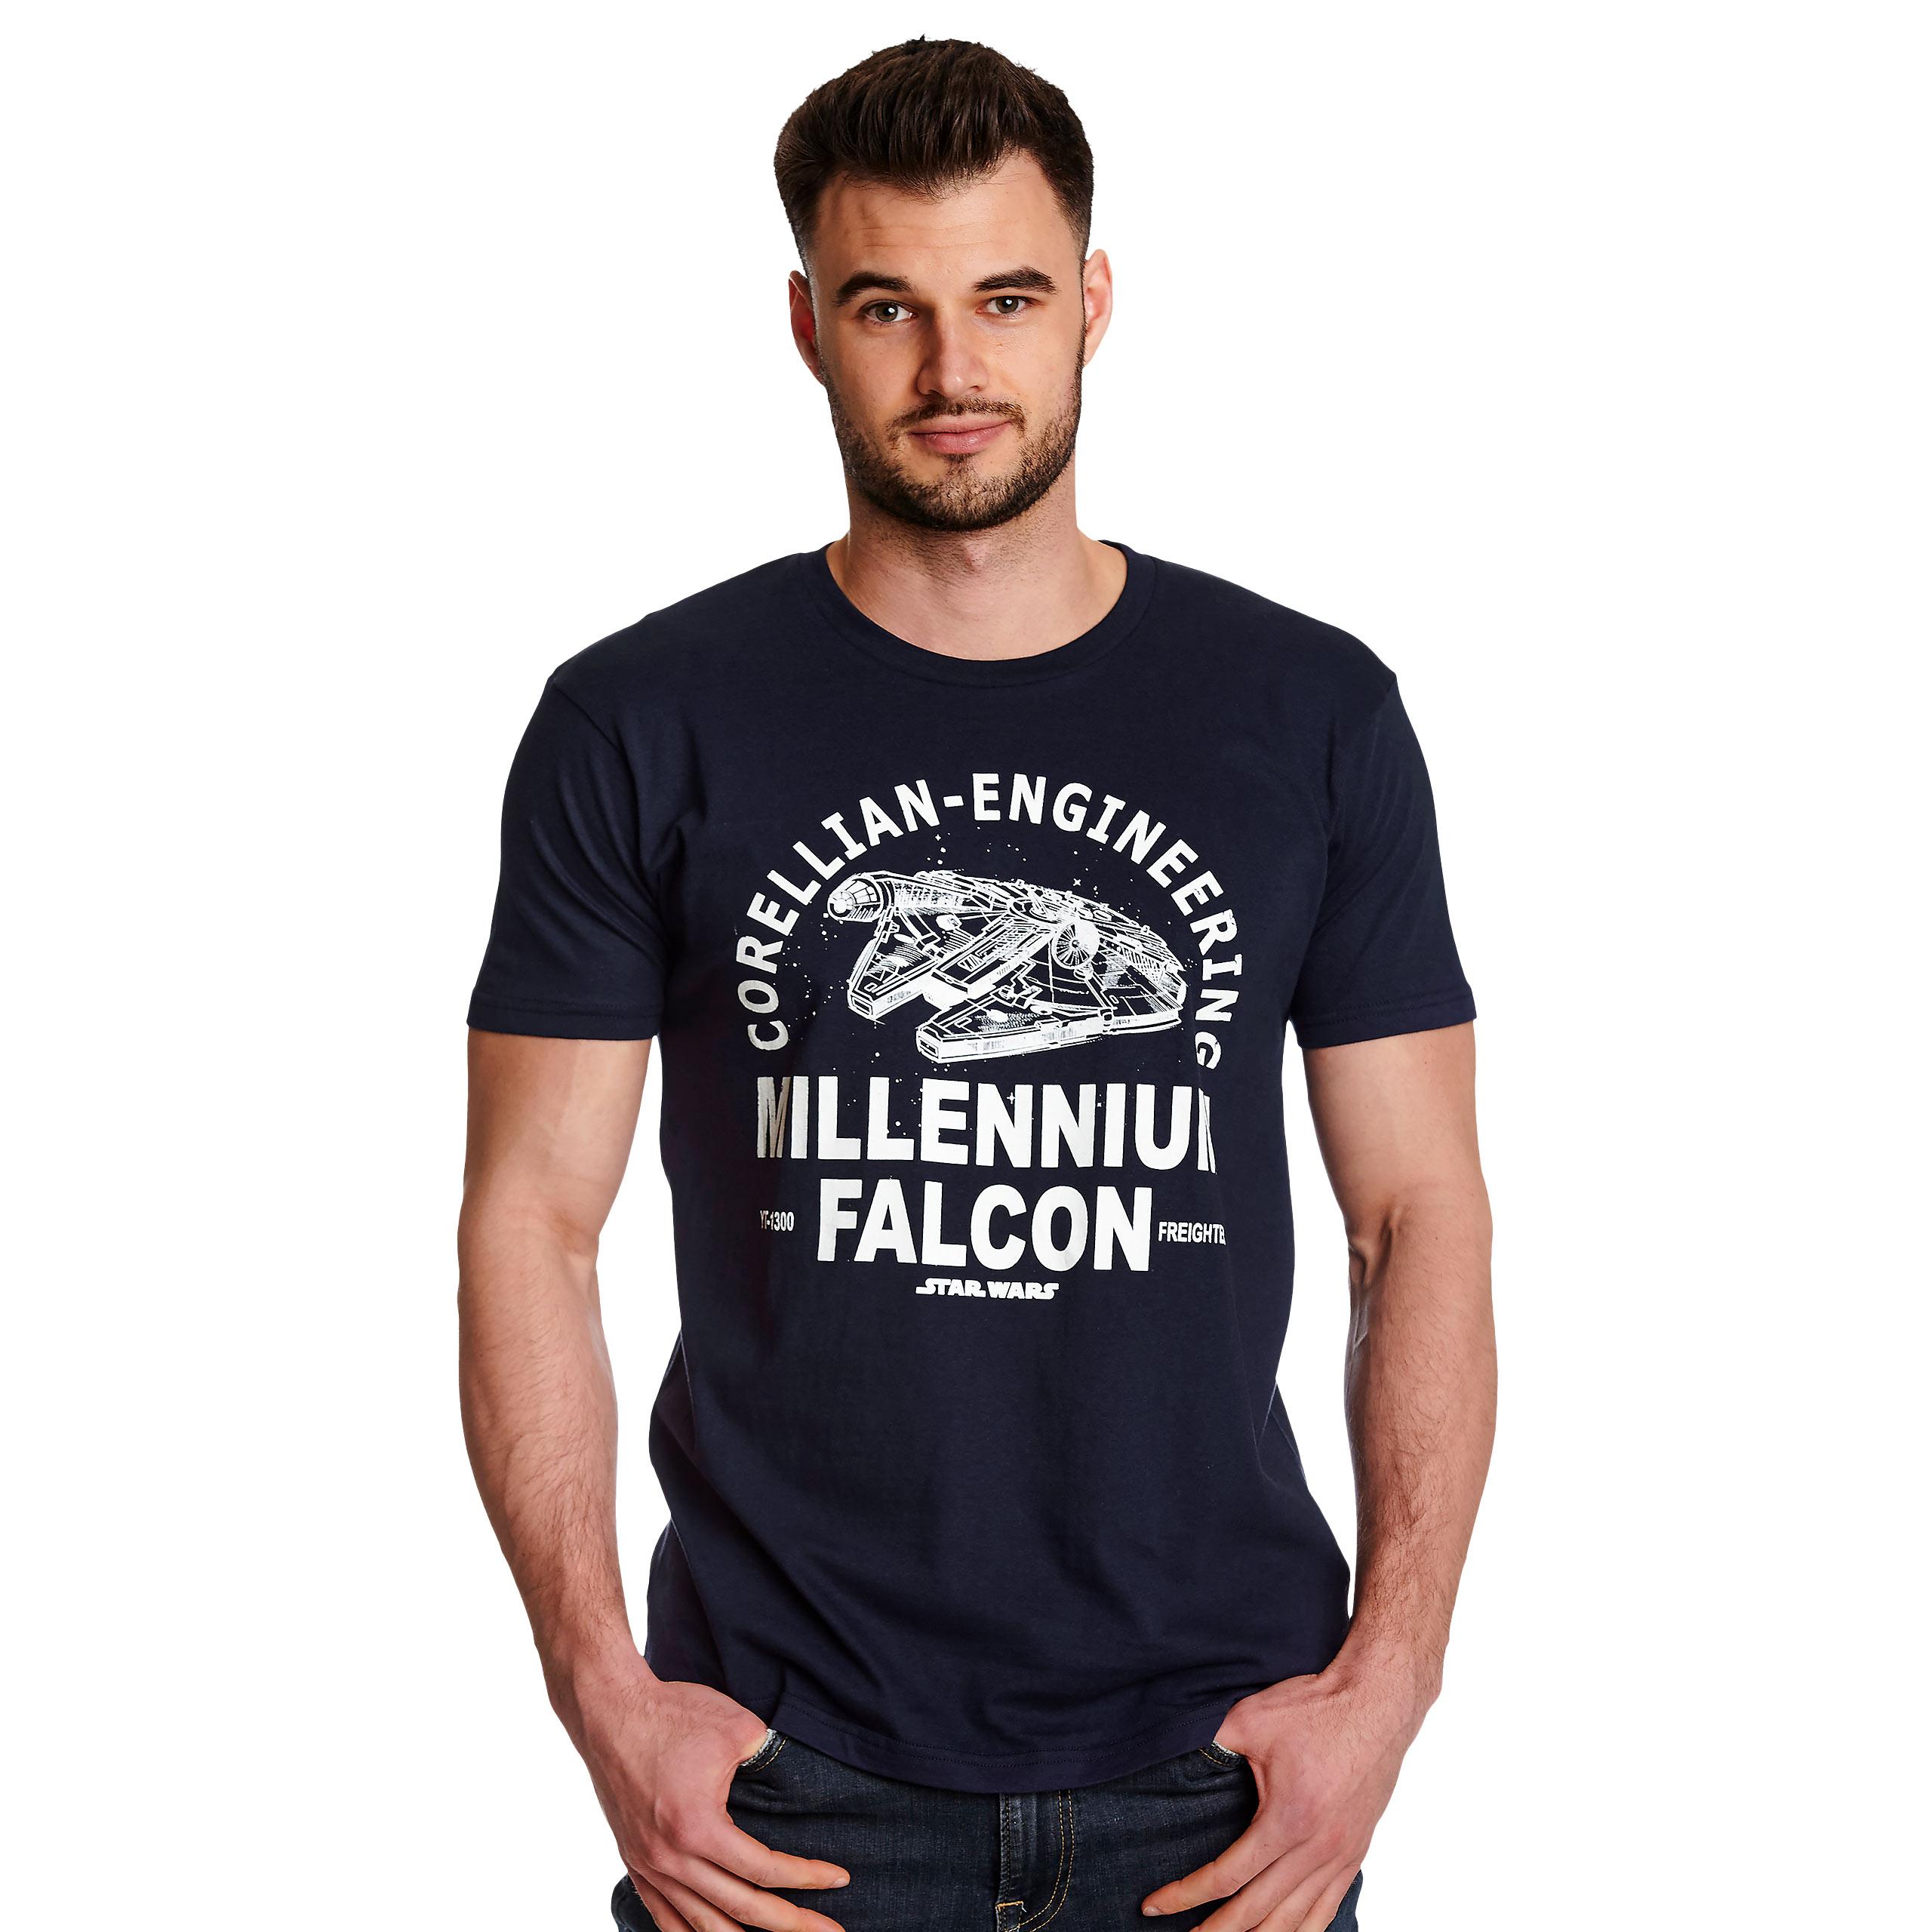 Star Wars - Millennium Falcon Corellian Engineering T-Shirt blau